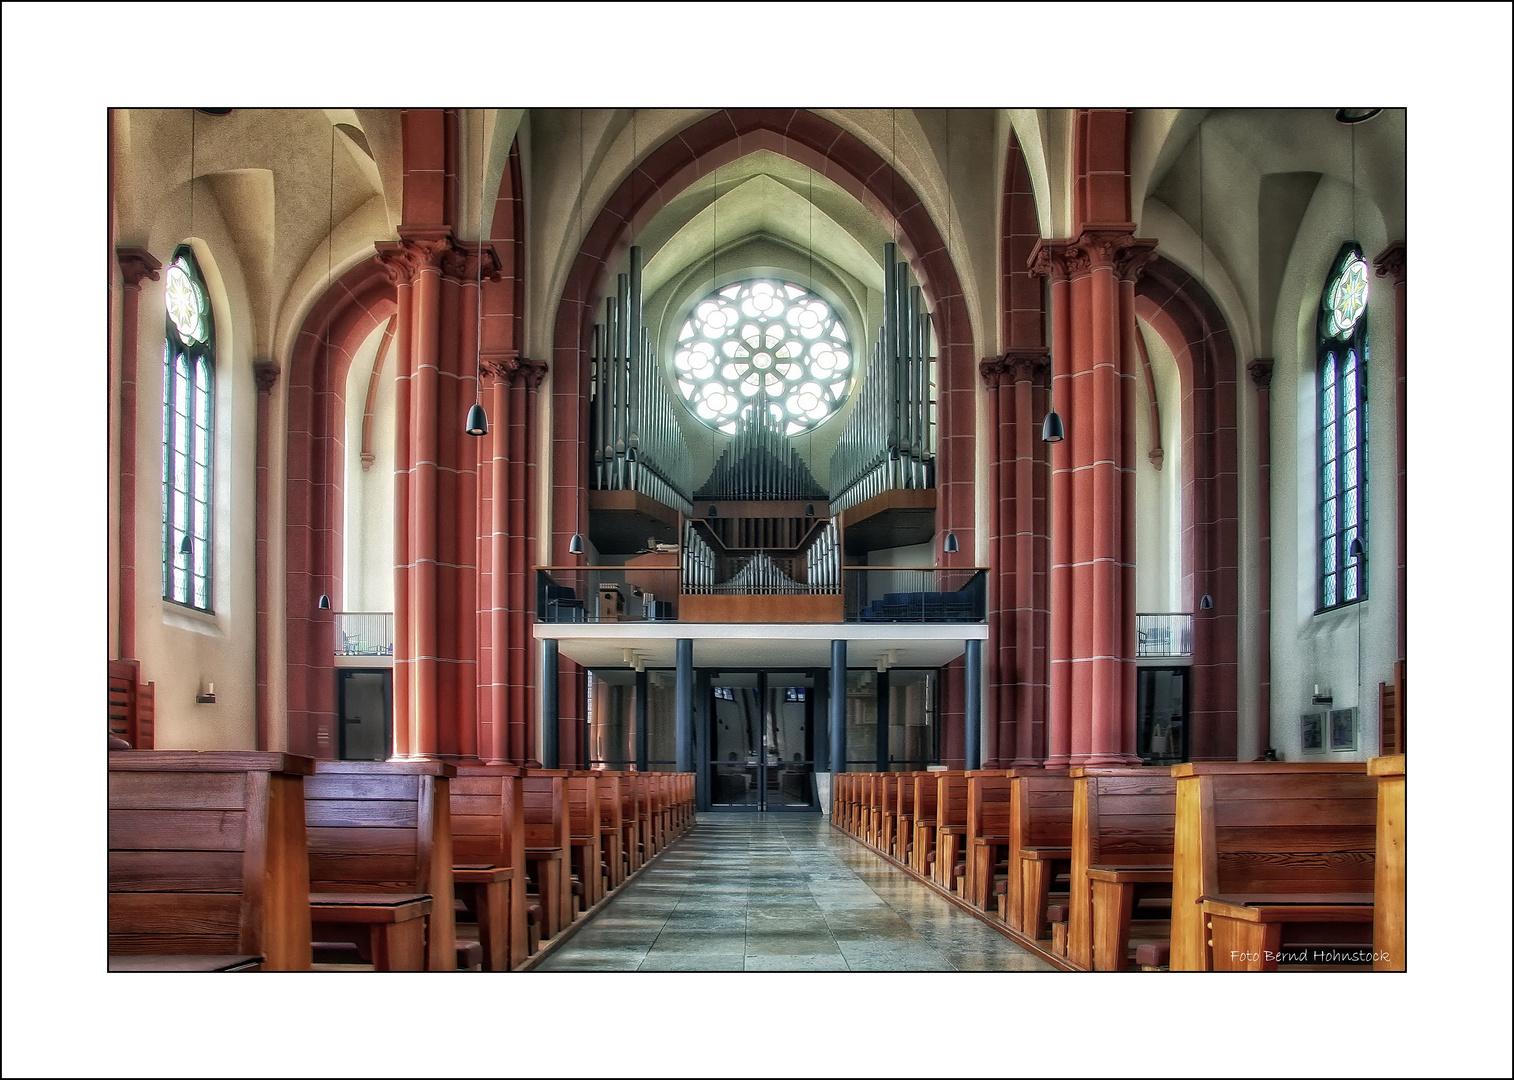 St. Clemens Solingen Orgel ..